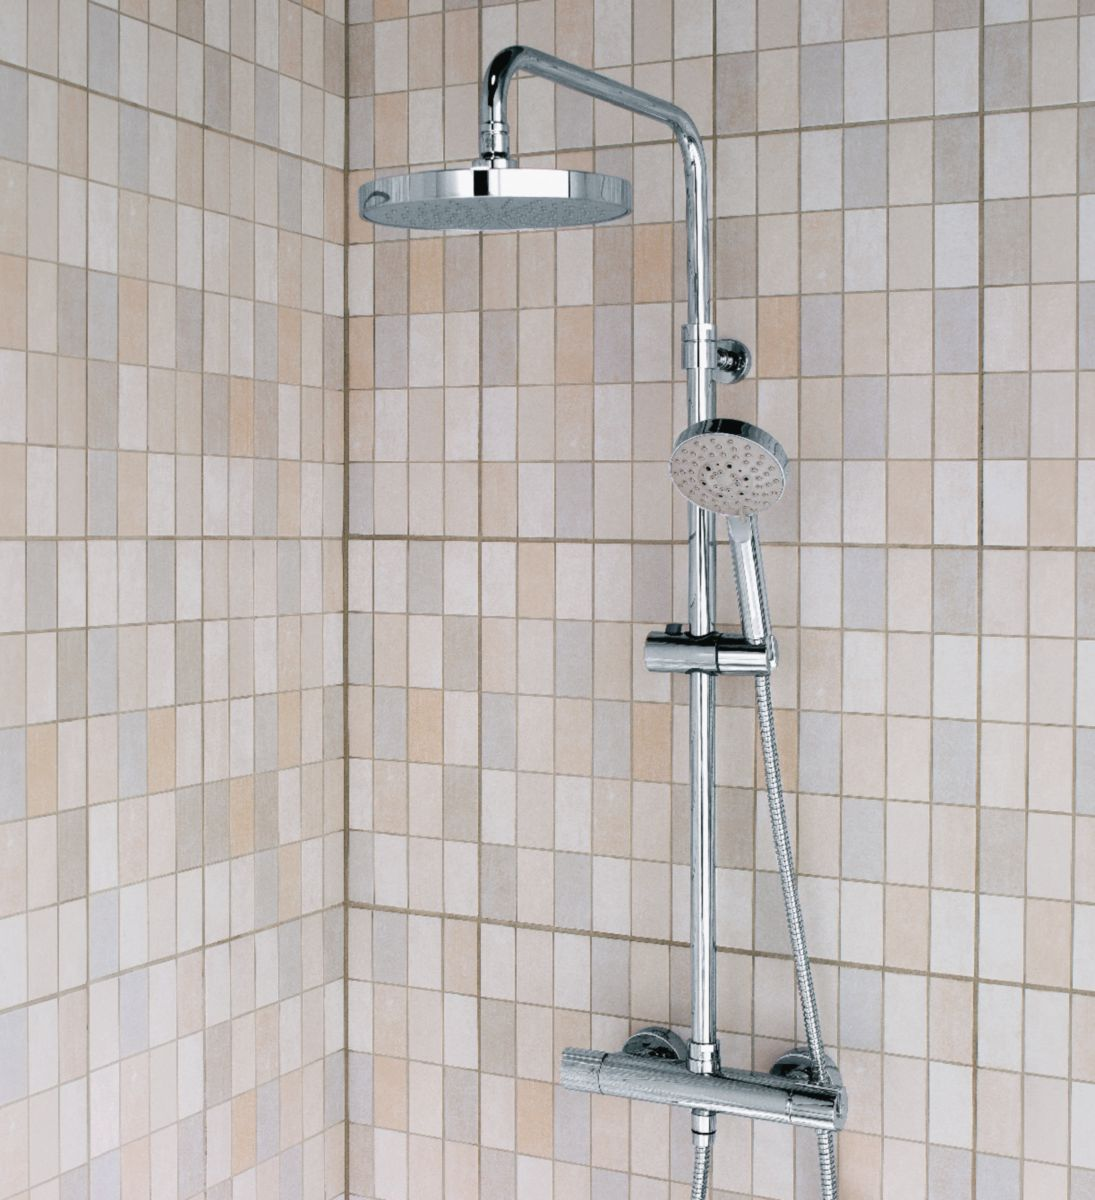 alterna colonne de douche concerto avec mitigeur thermostatique chrom cedeo. Black Bedroom Furniture Sets. Home Design Ideas